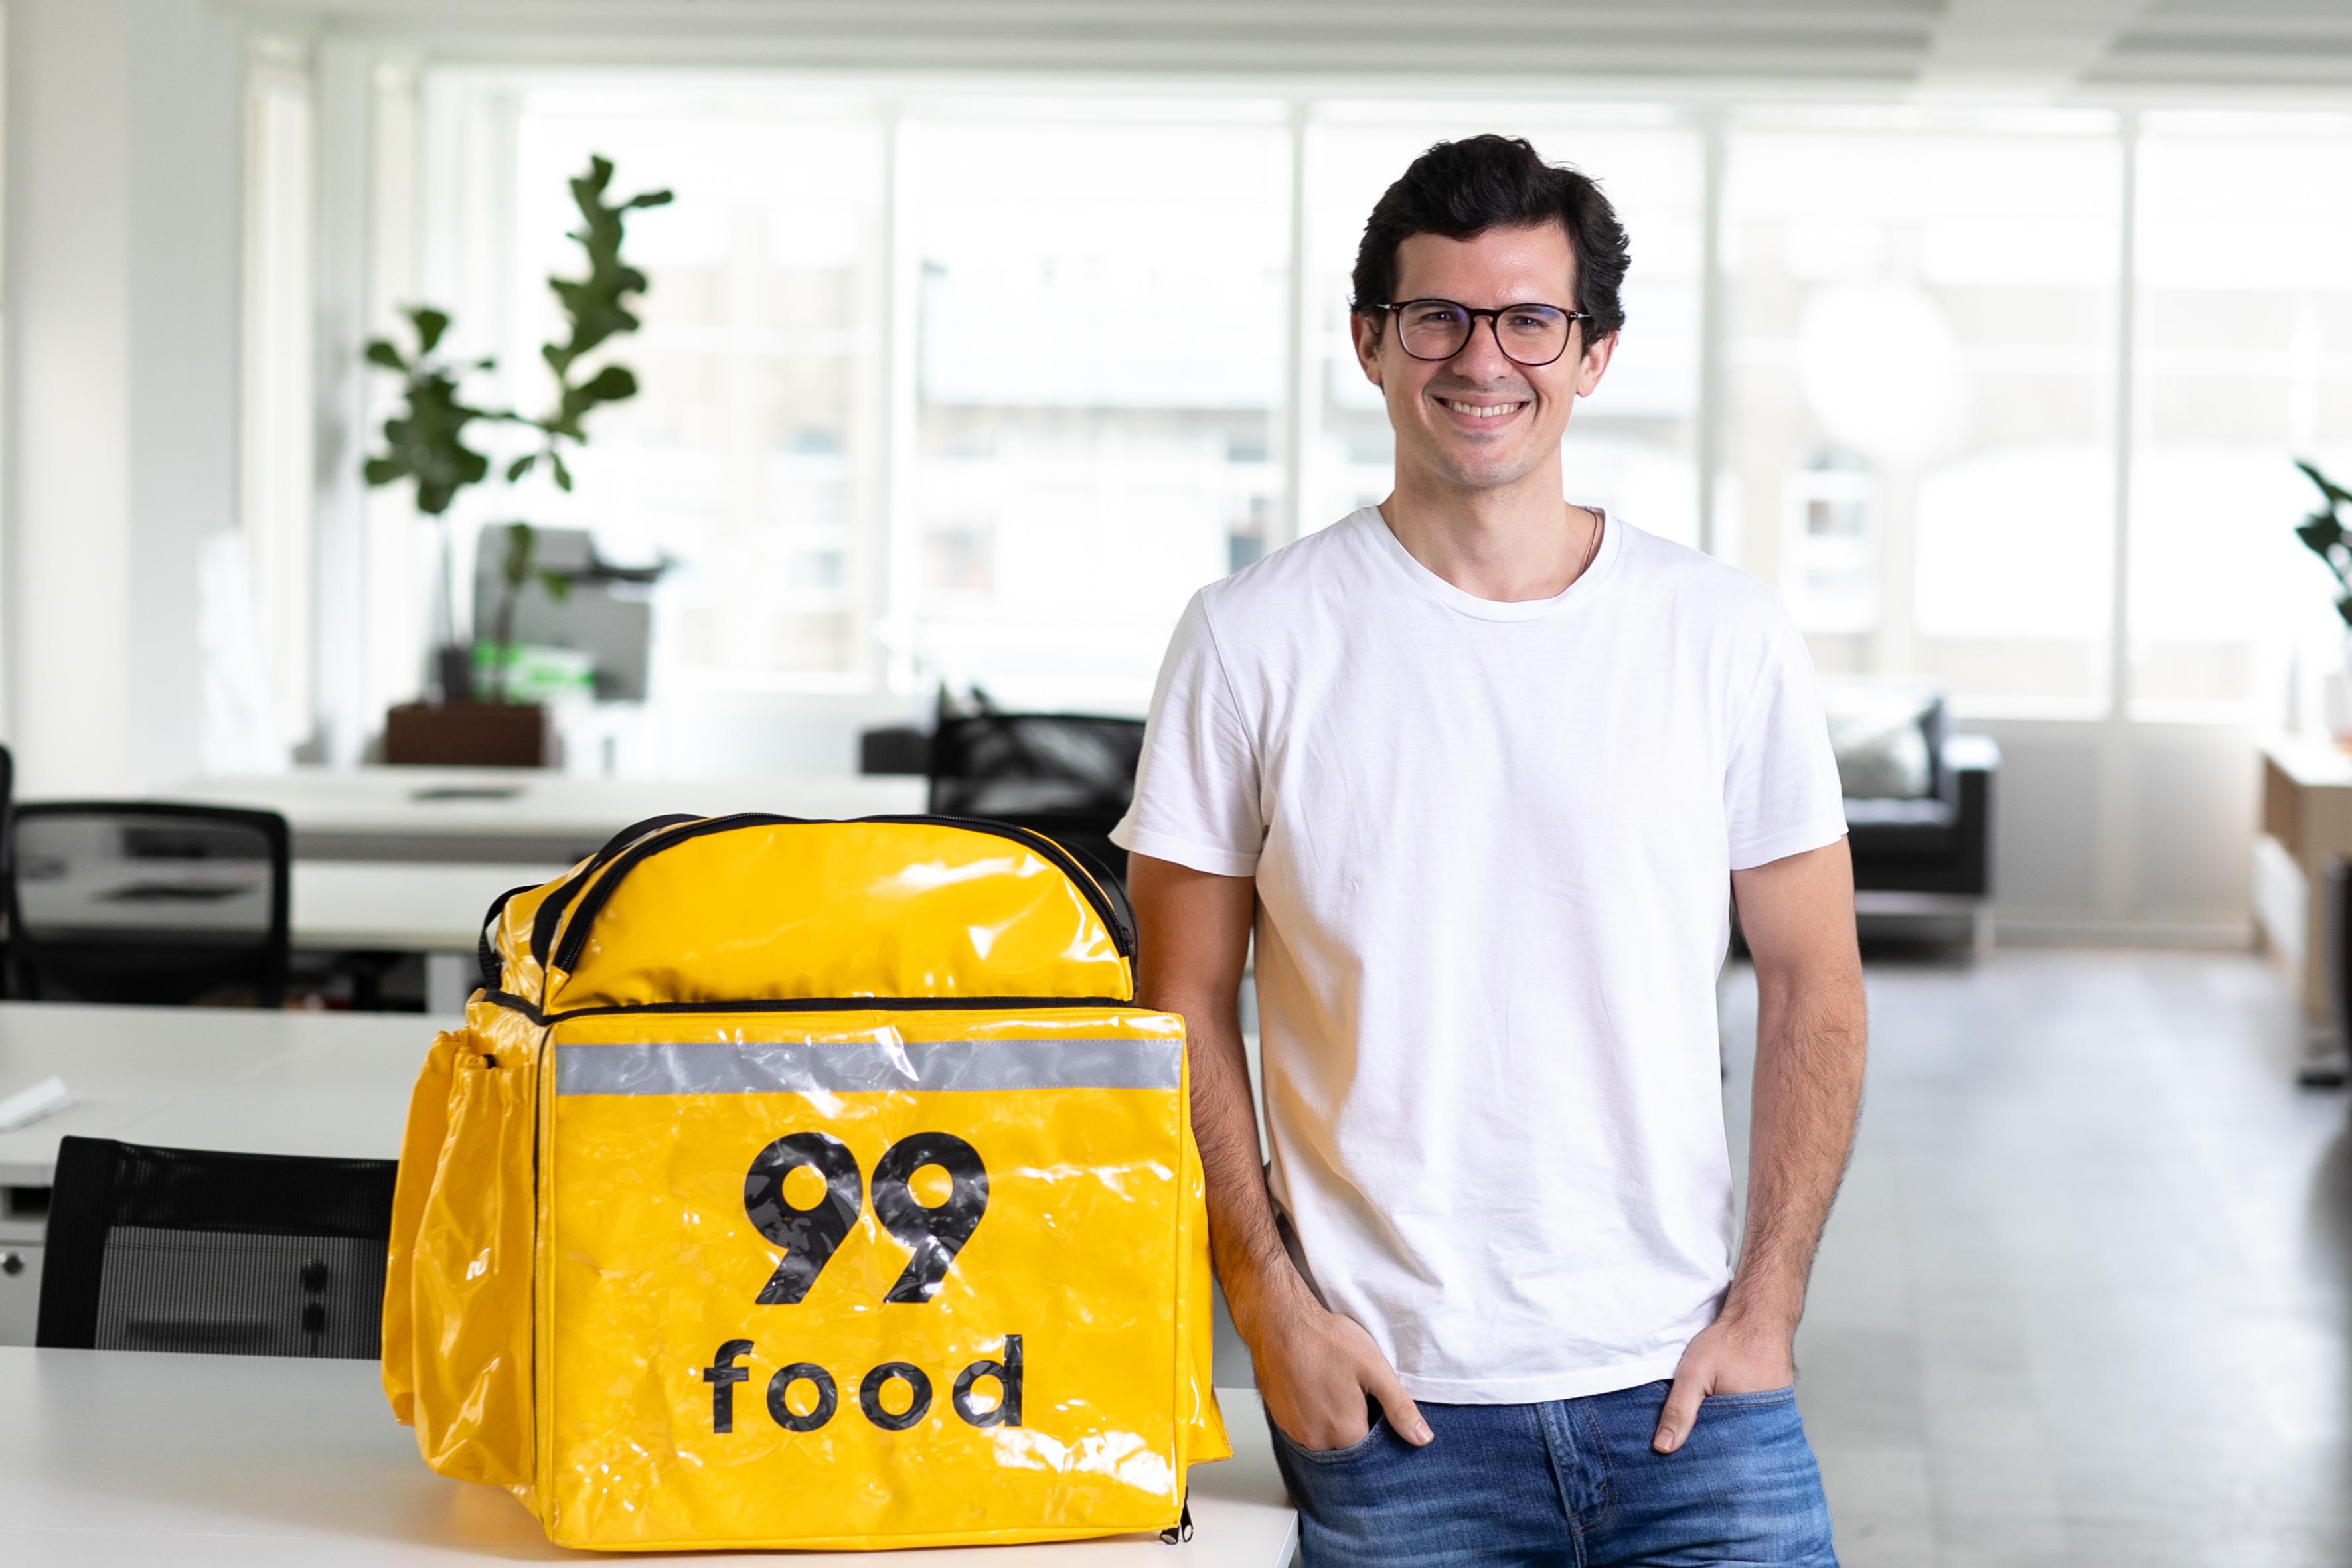 99 Food Danilo Mansano